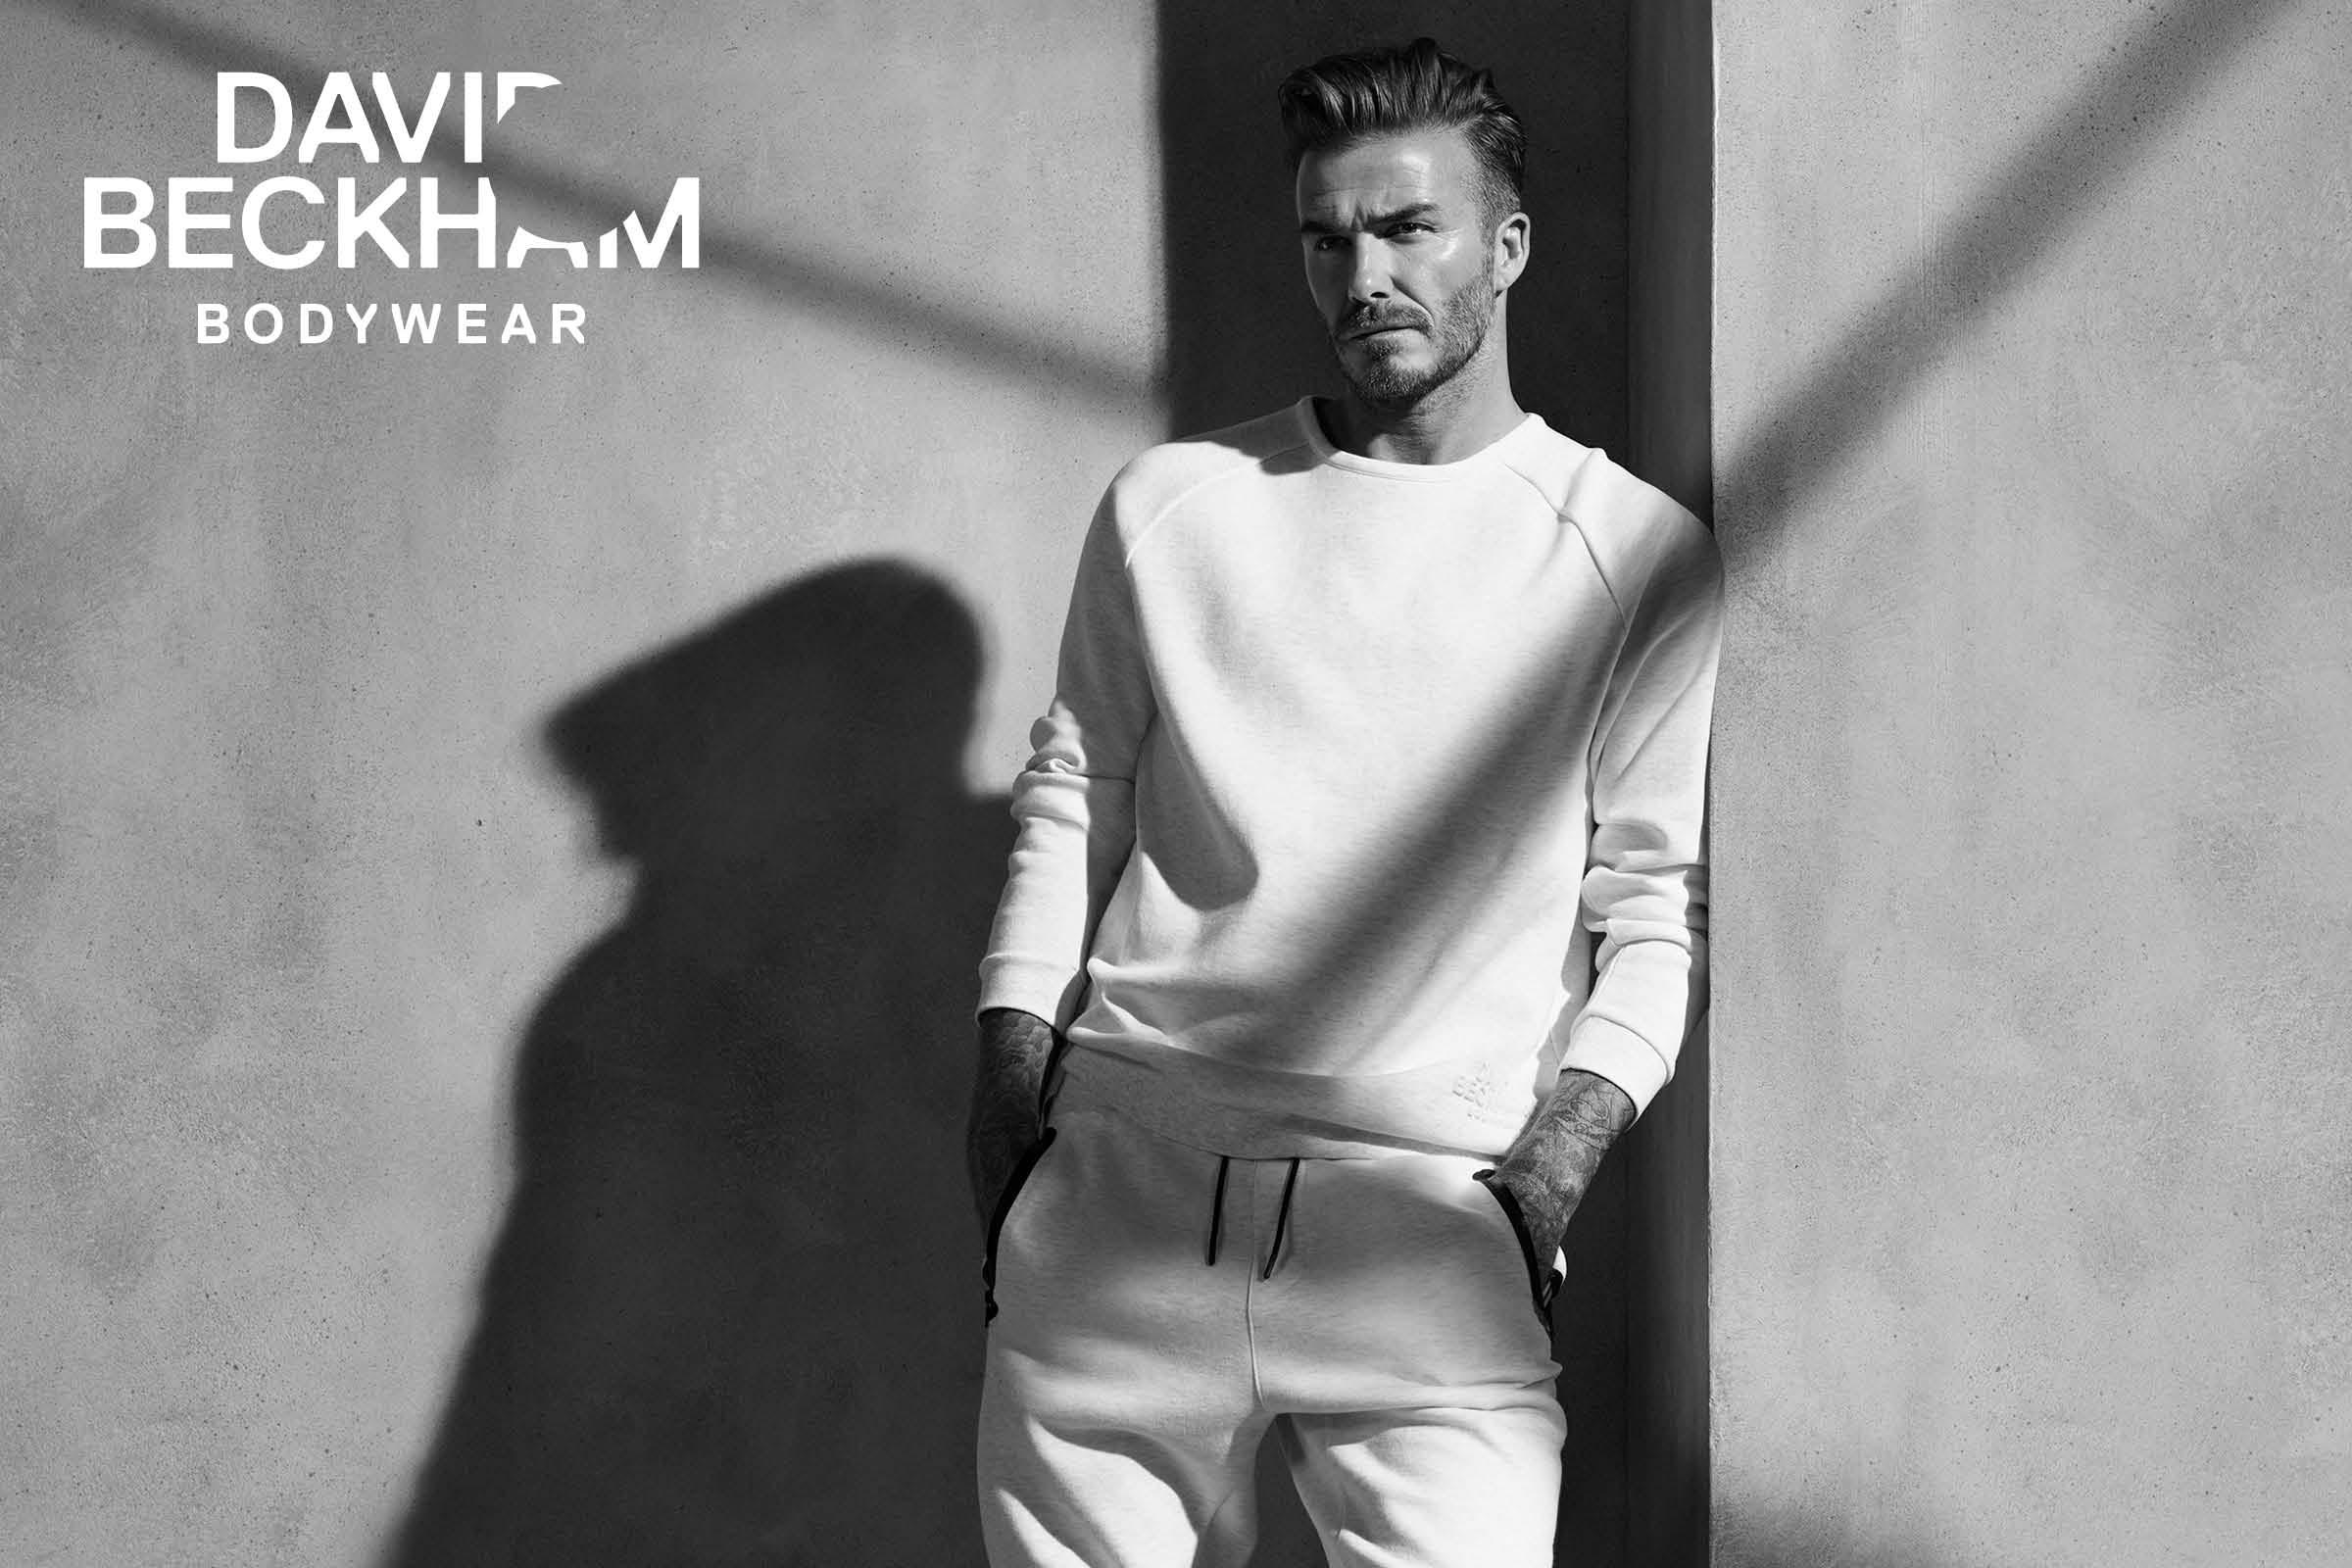 5PB-Beckham-Bodywear-CPD-1-en_GEN.jpg